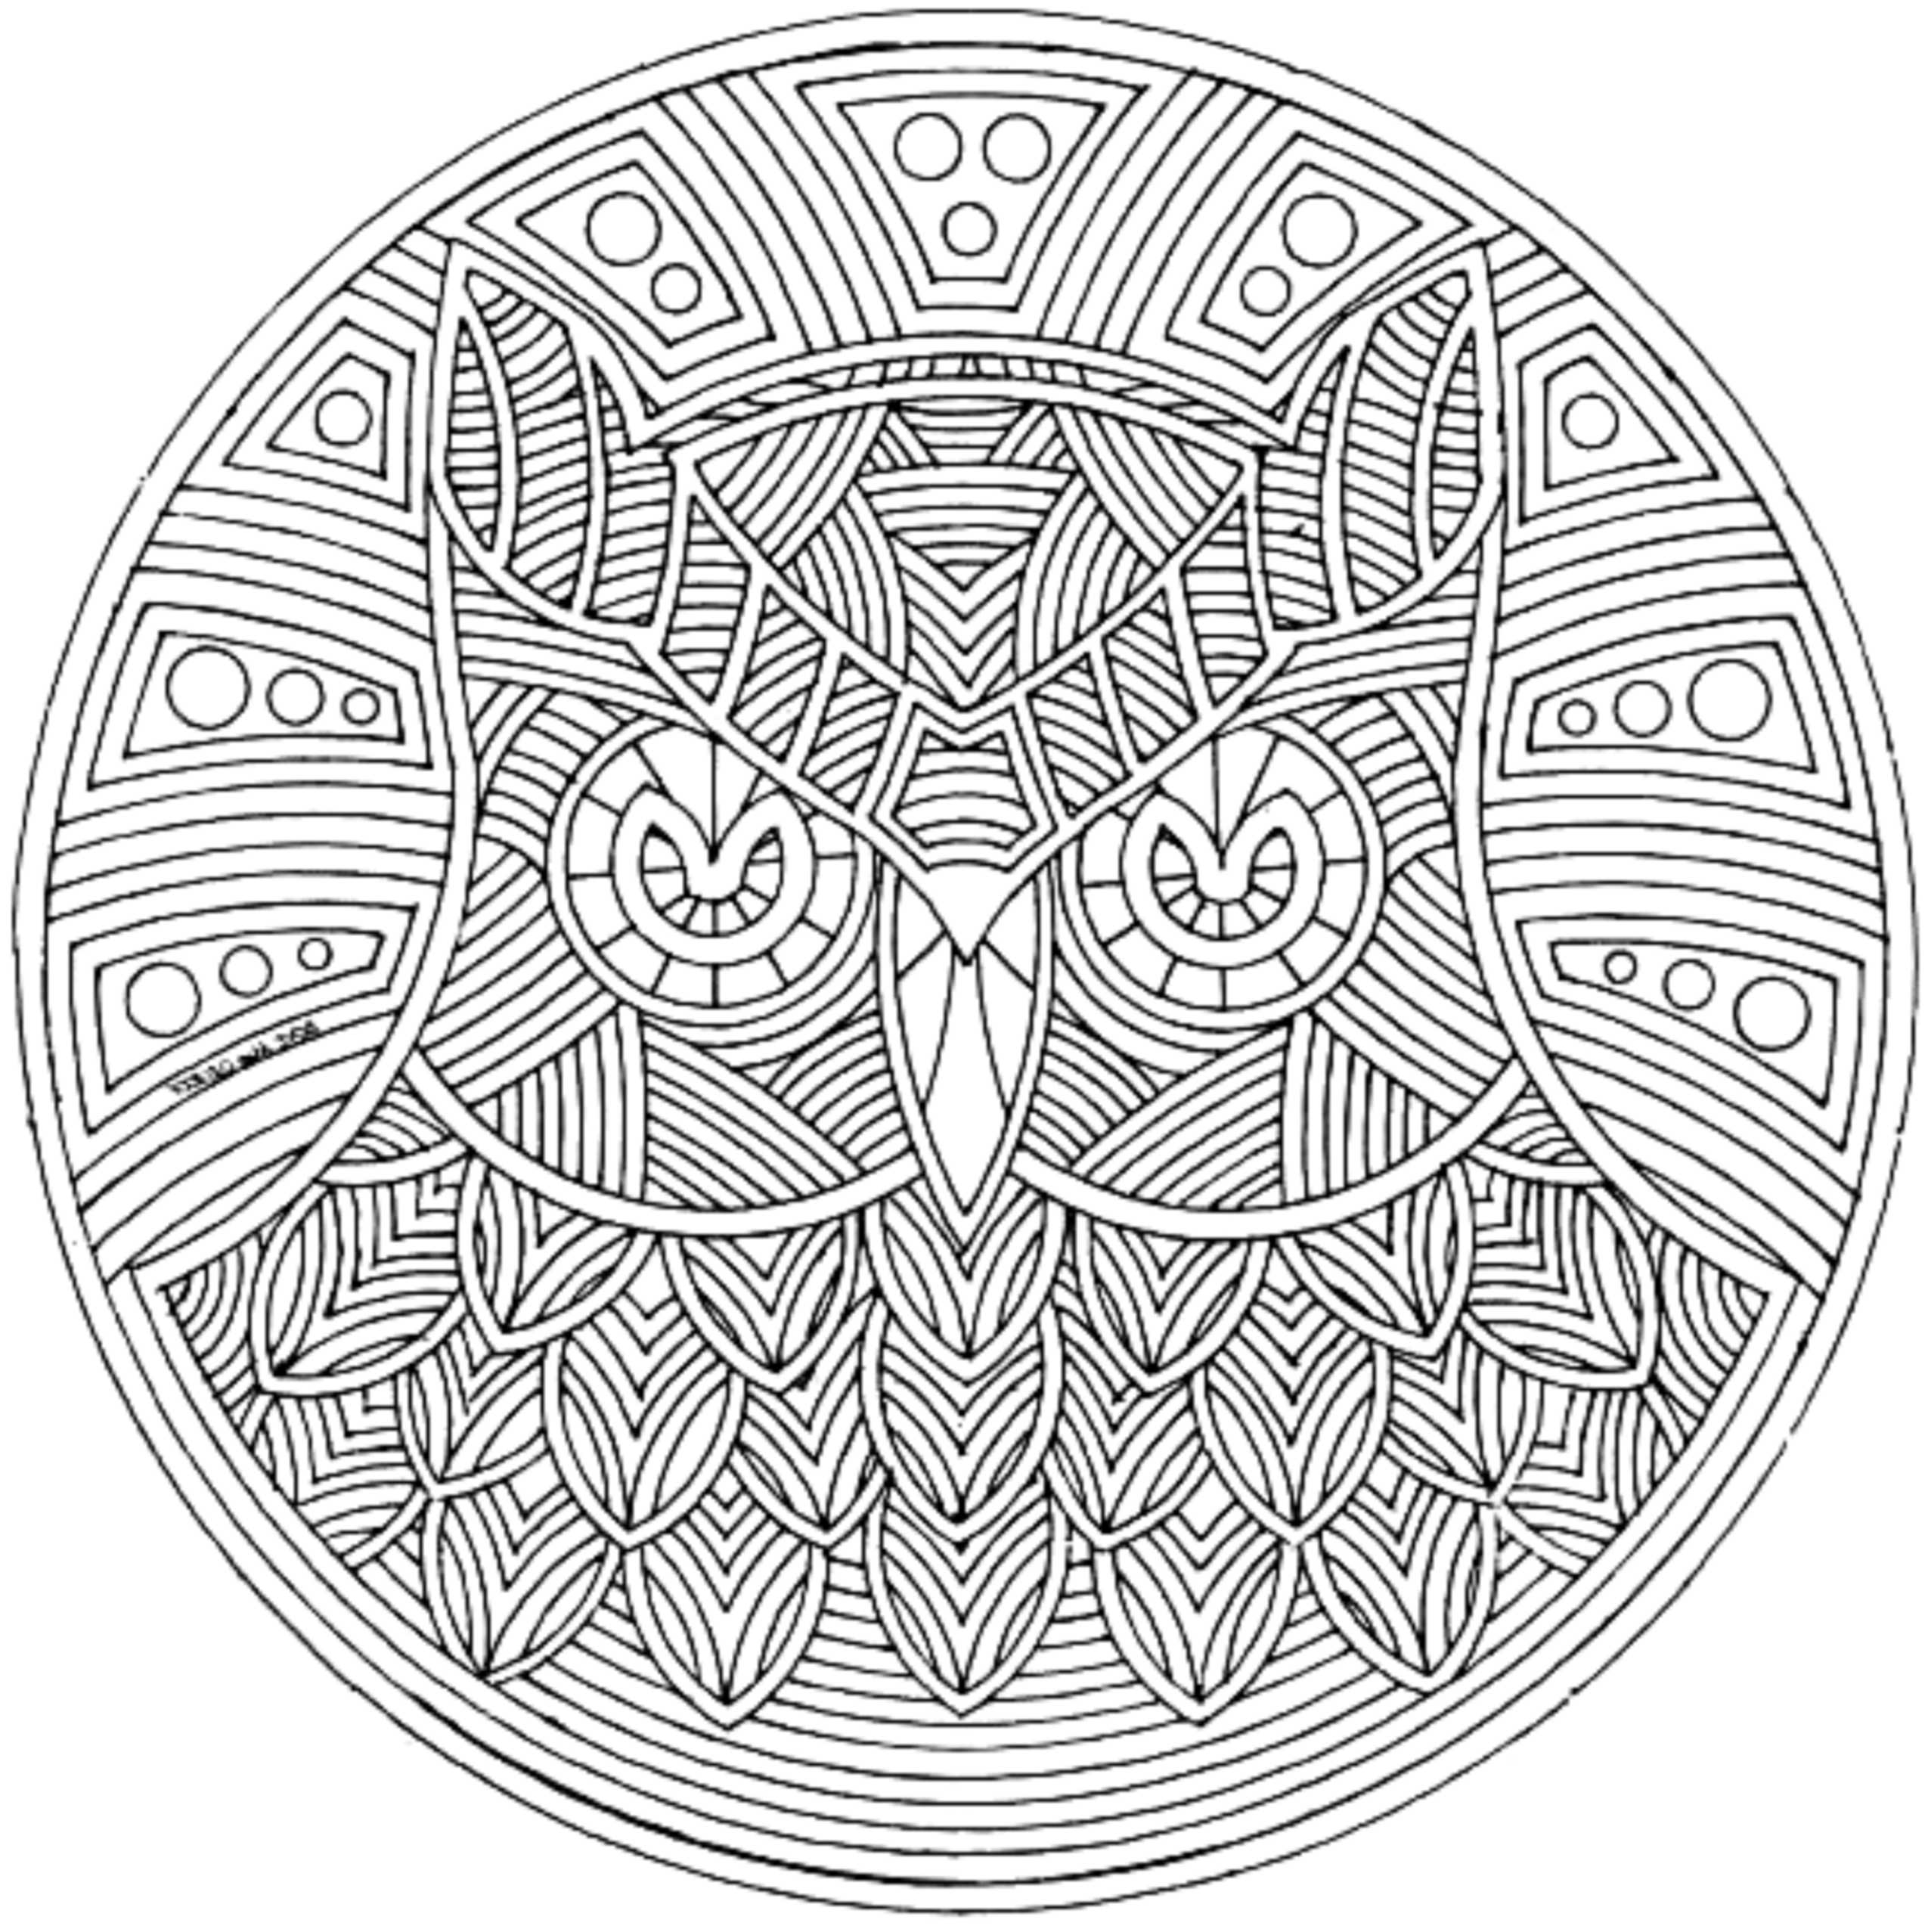 2550x2555 Printable Printable Adult Coloring Pages Printable Trippy Art Plex